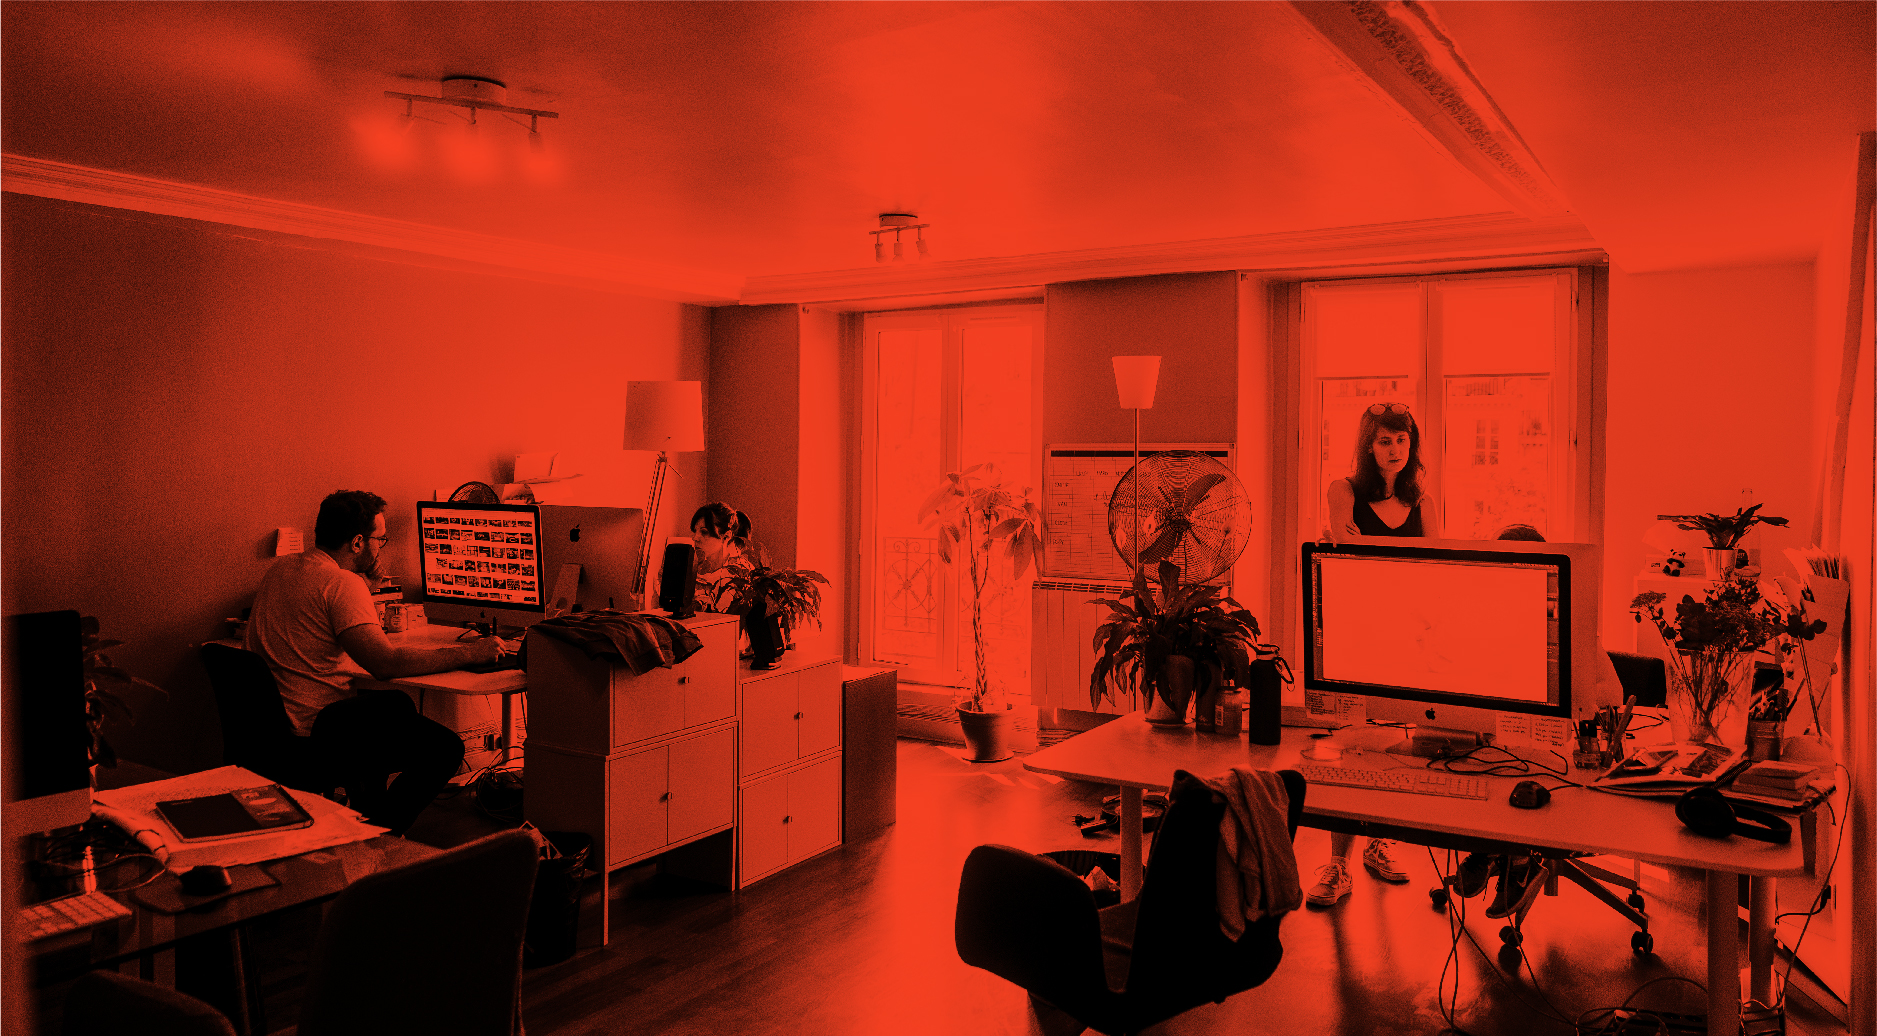 Locaux Thalamus agence communication stratégie digitale Paris studio design